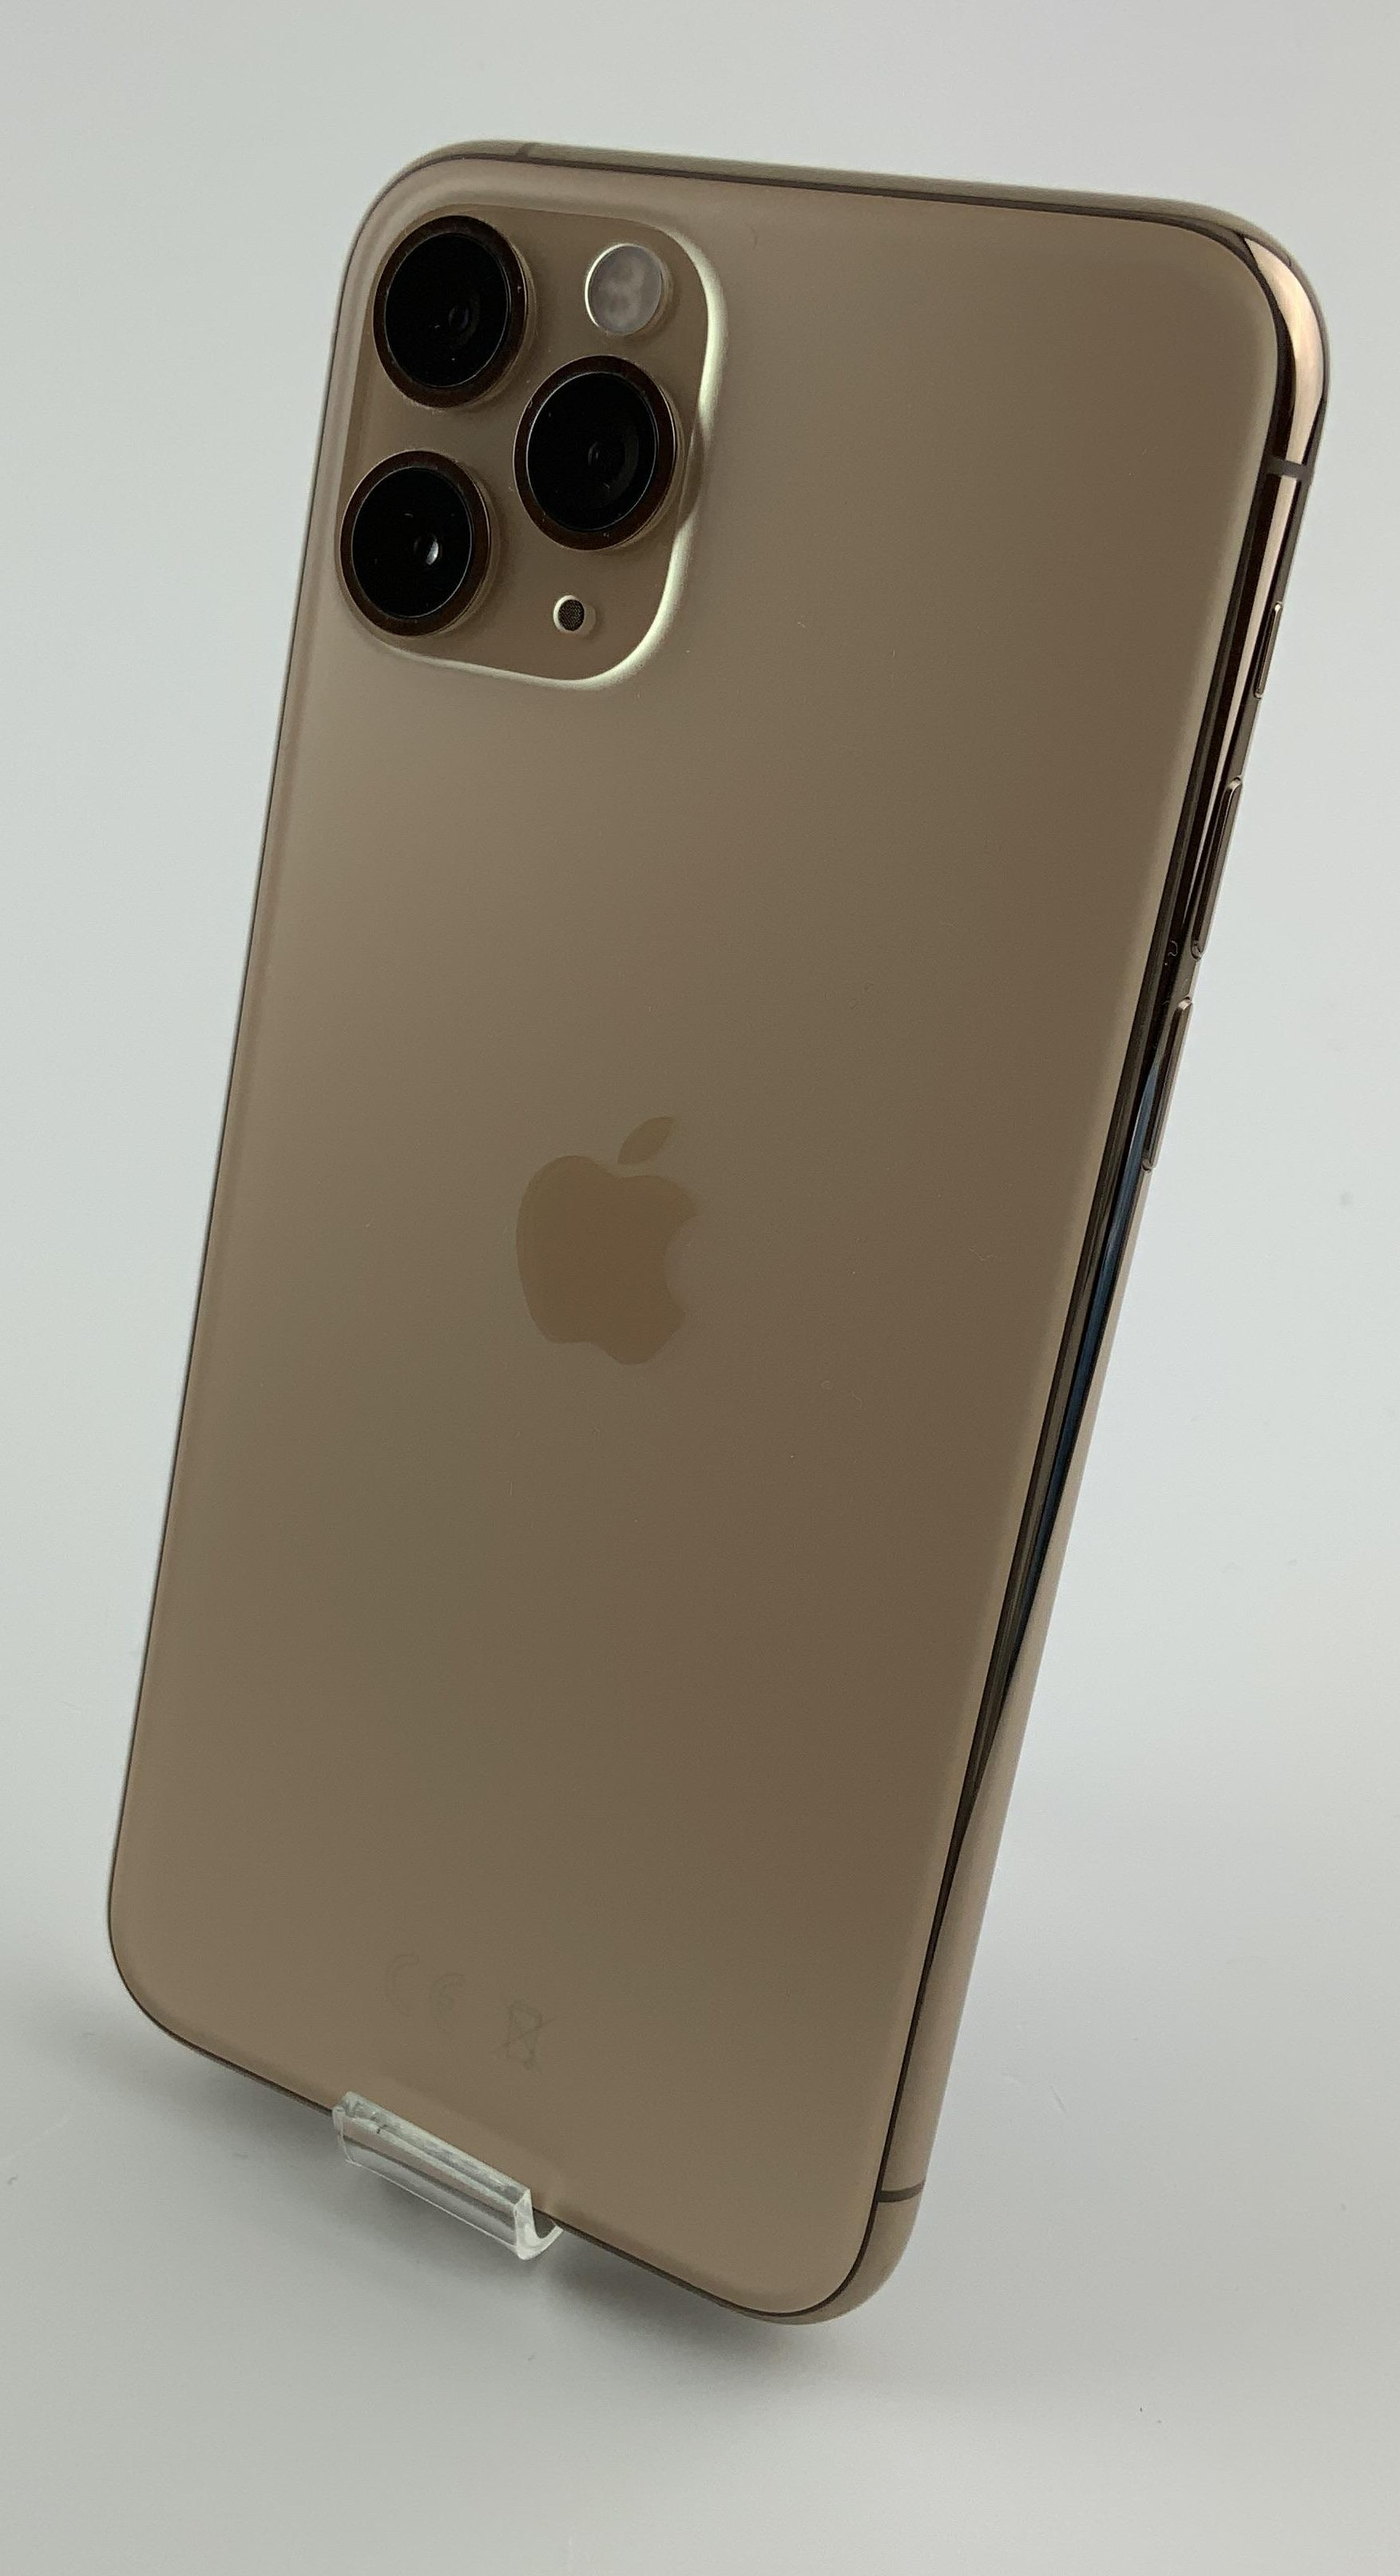 iPhone 11 Pro 64GB, 64GB, Gold, image 2